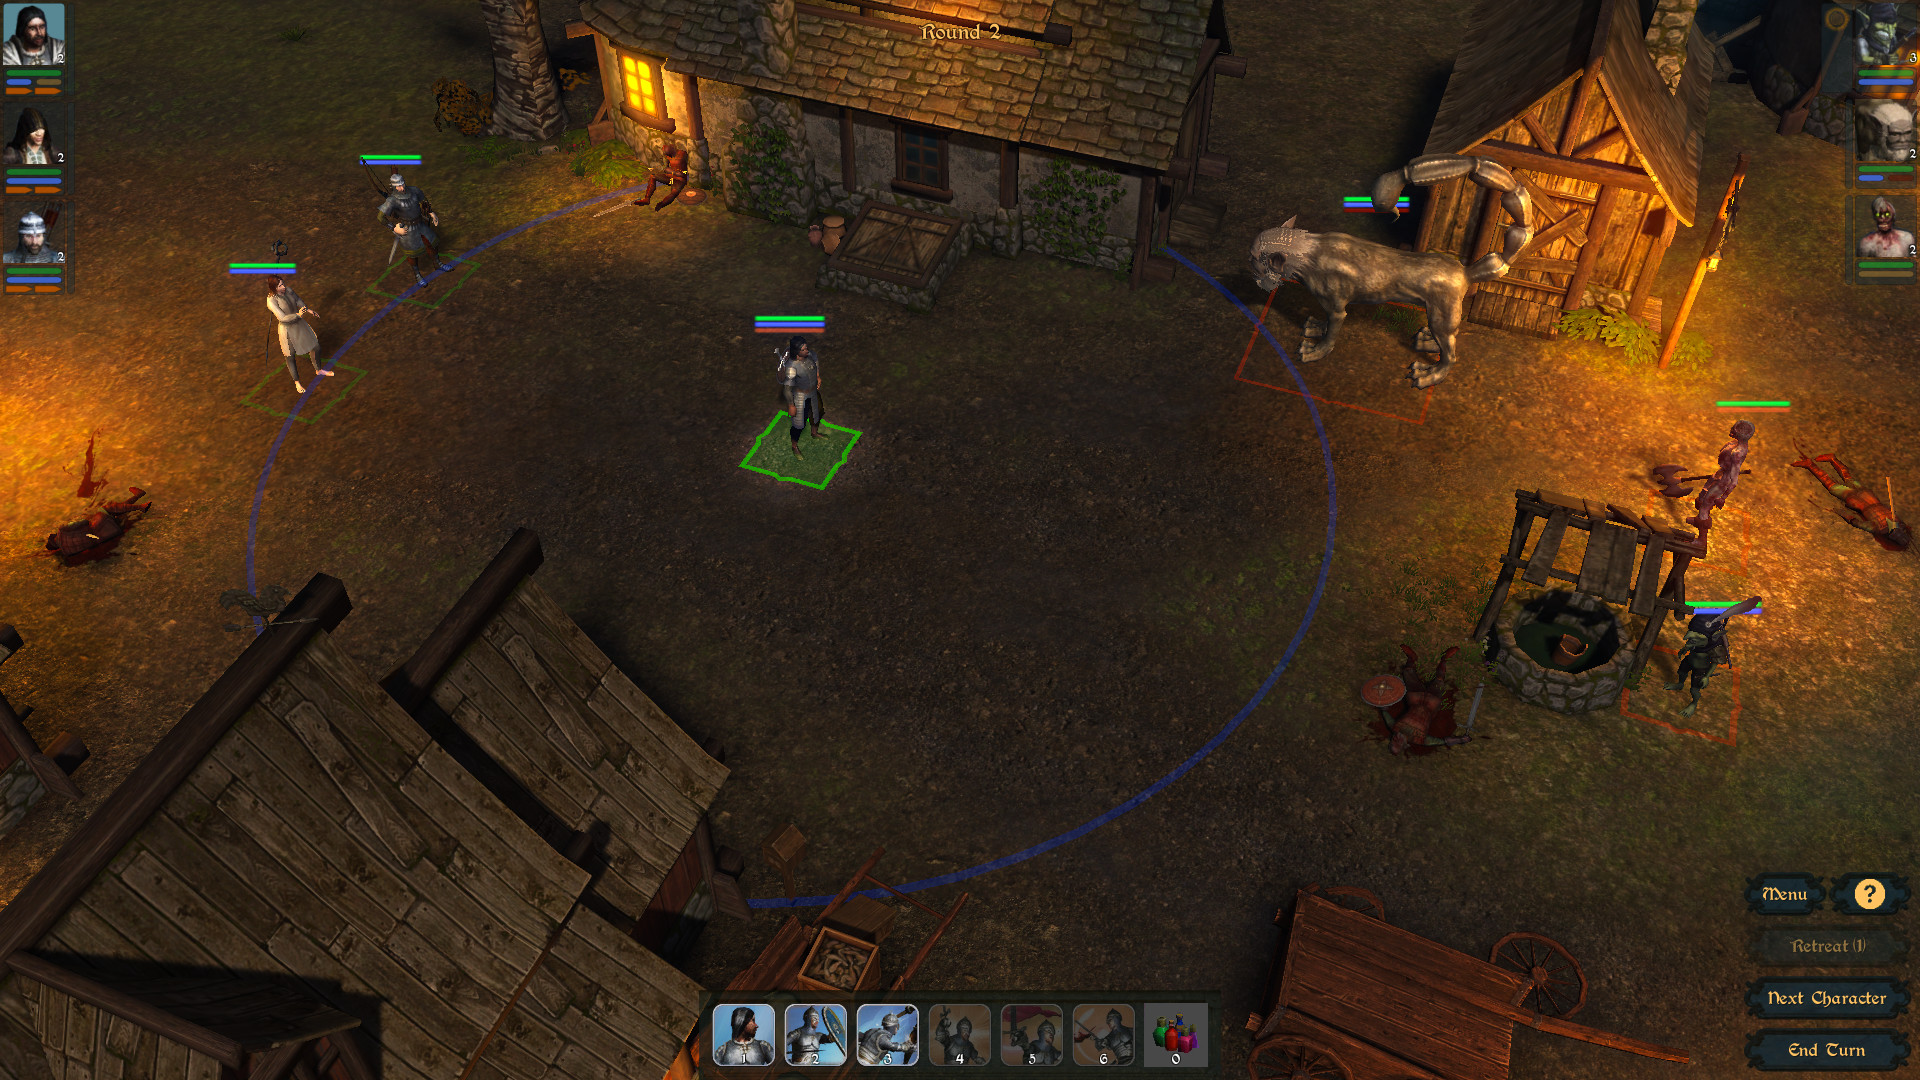 The Storm Guard: Darkness Screenshot 2